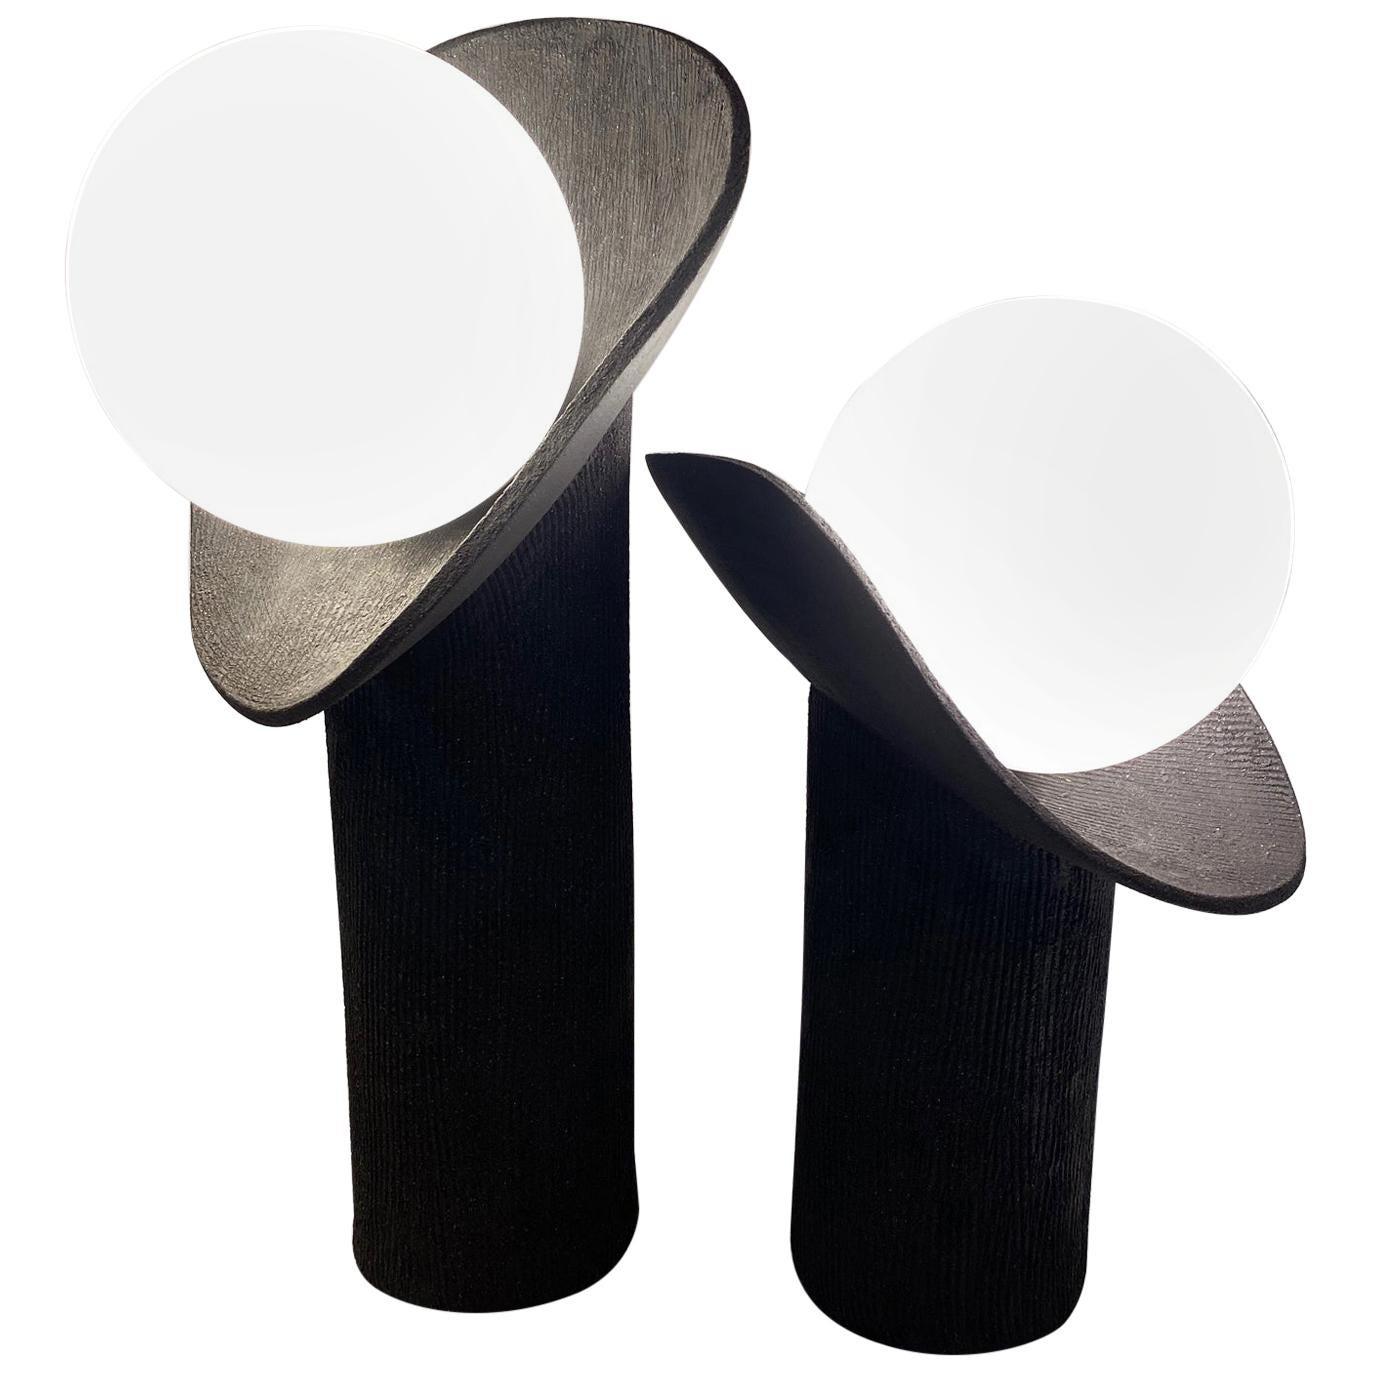 Set of 2 Ceramic Lamps by Olivia Cognet